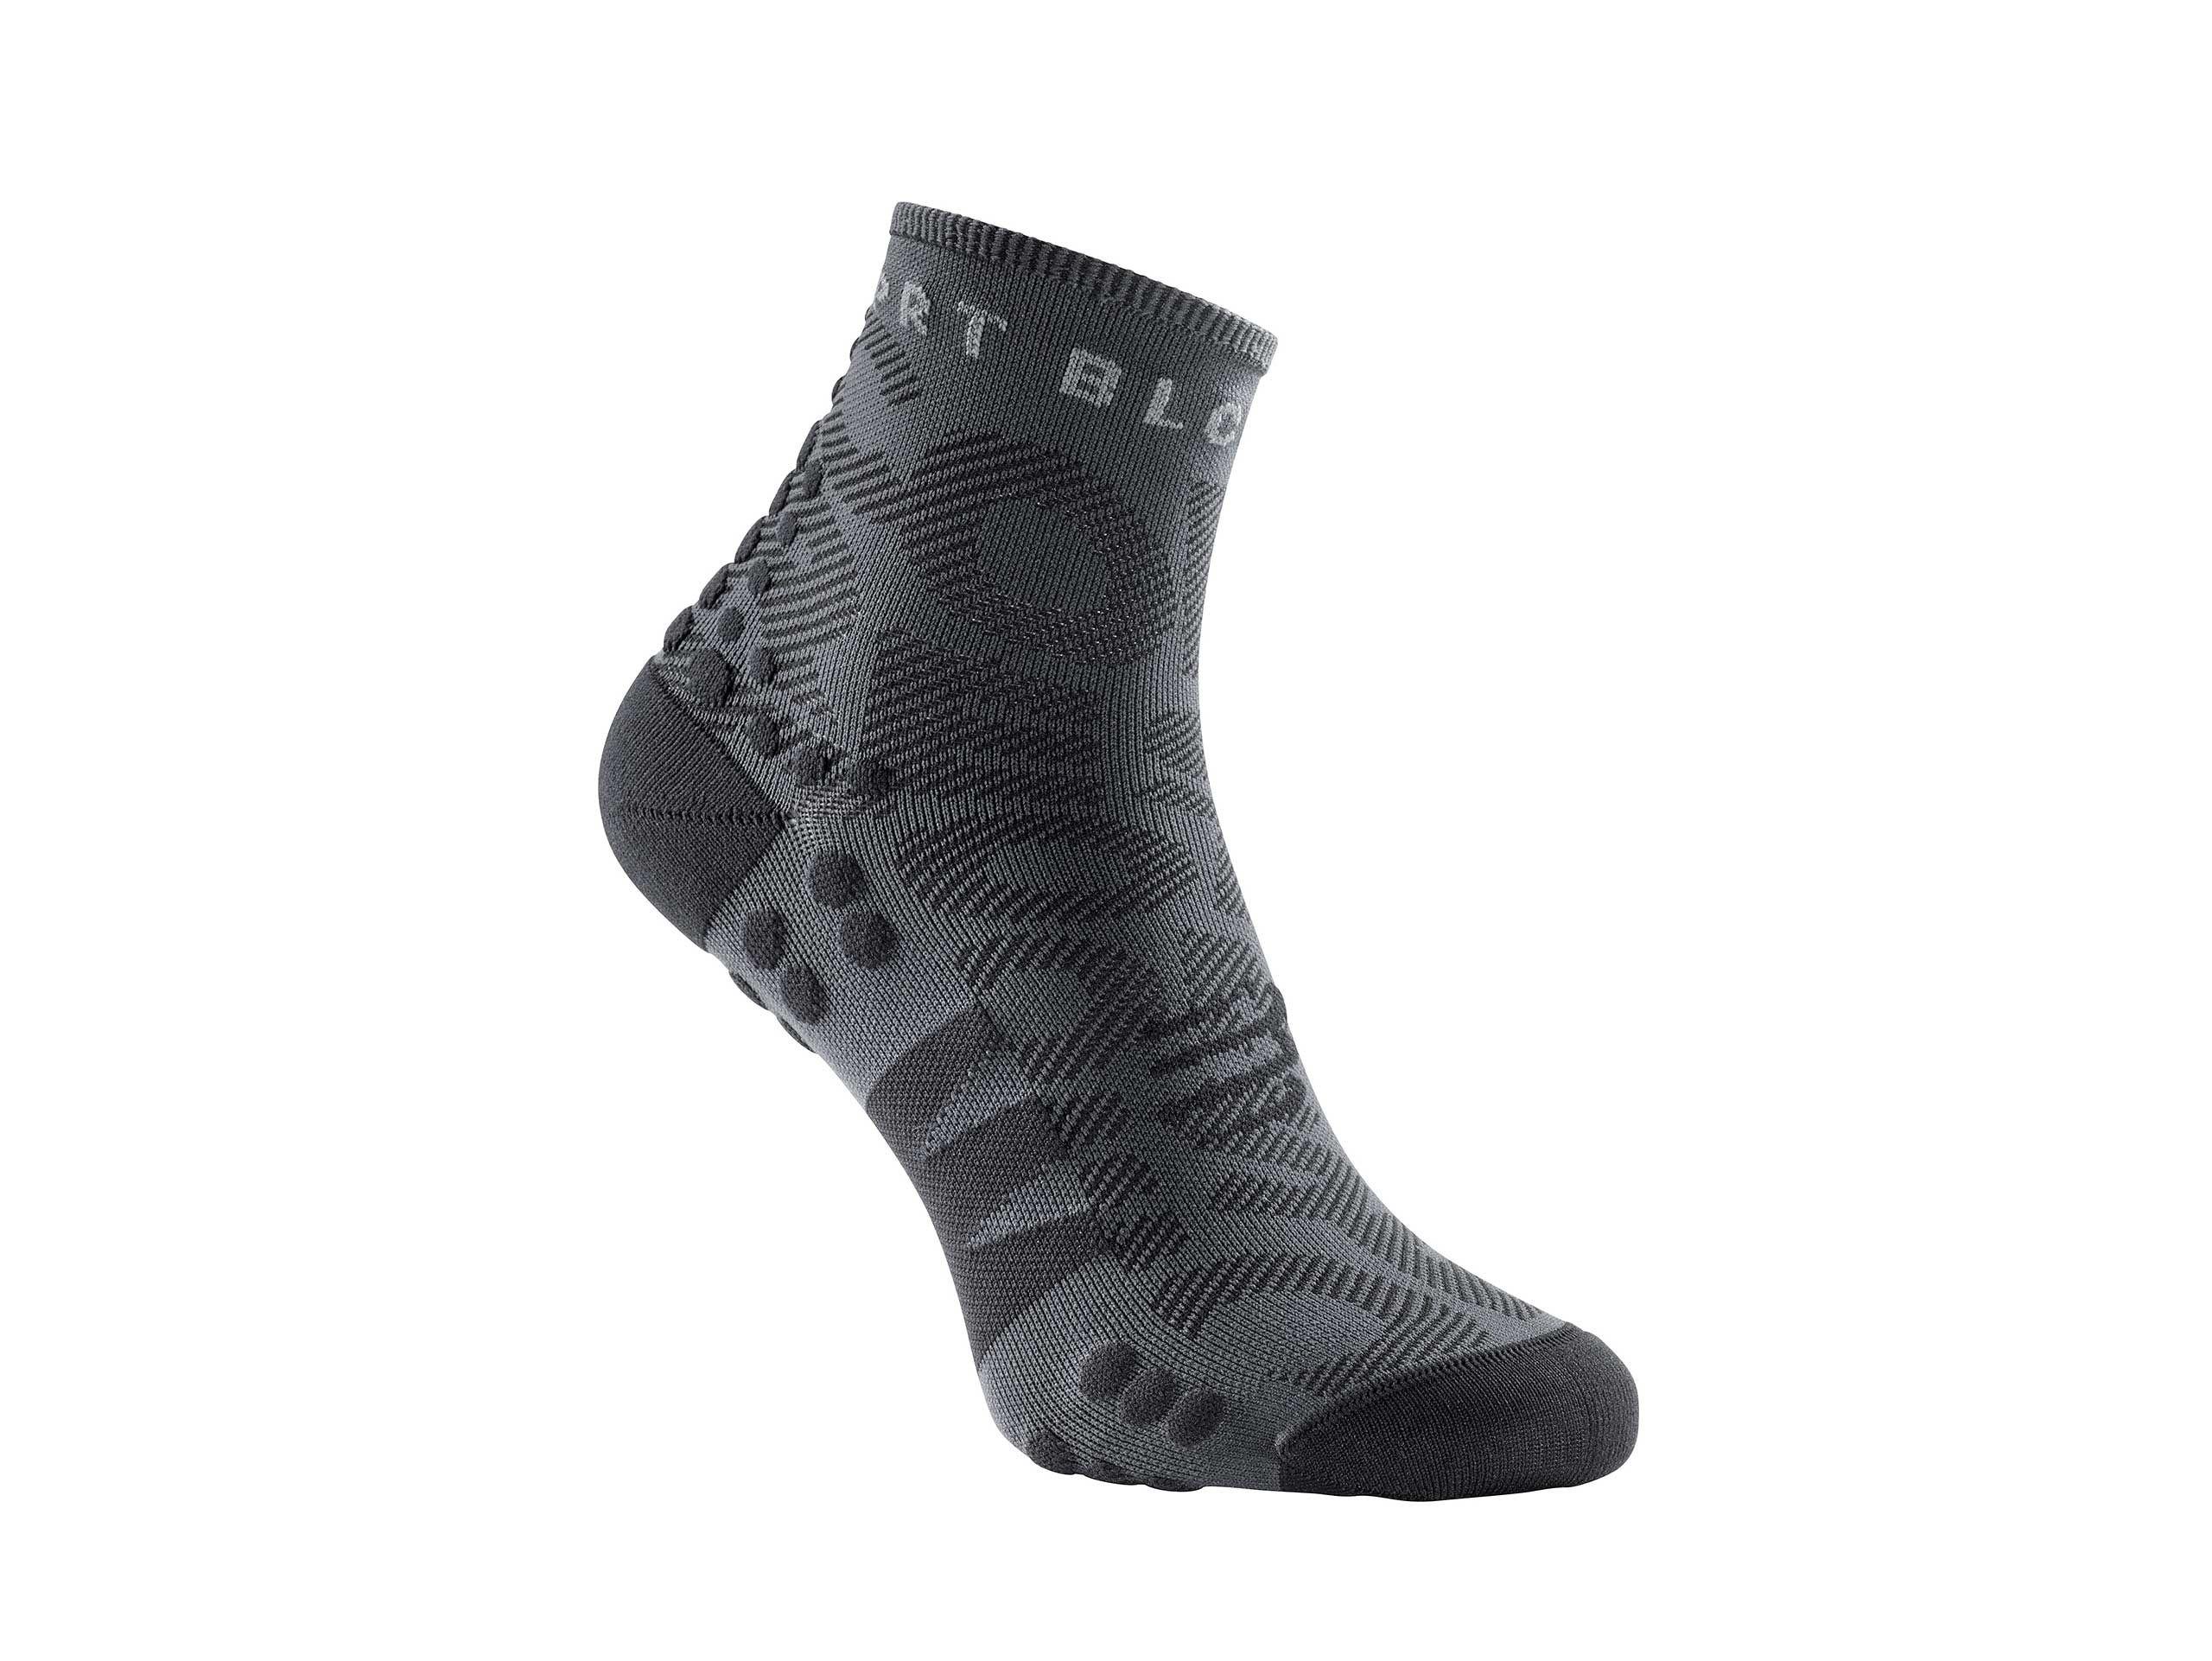 Pro Racing Socks v3.0 Run High - Black Edition 2020